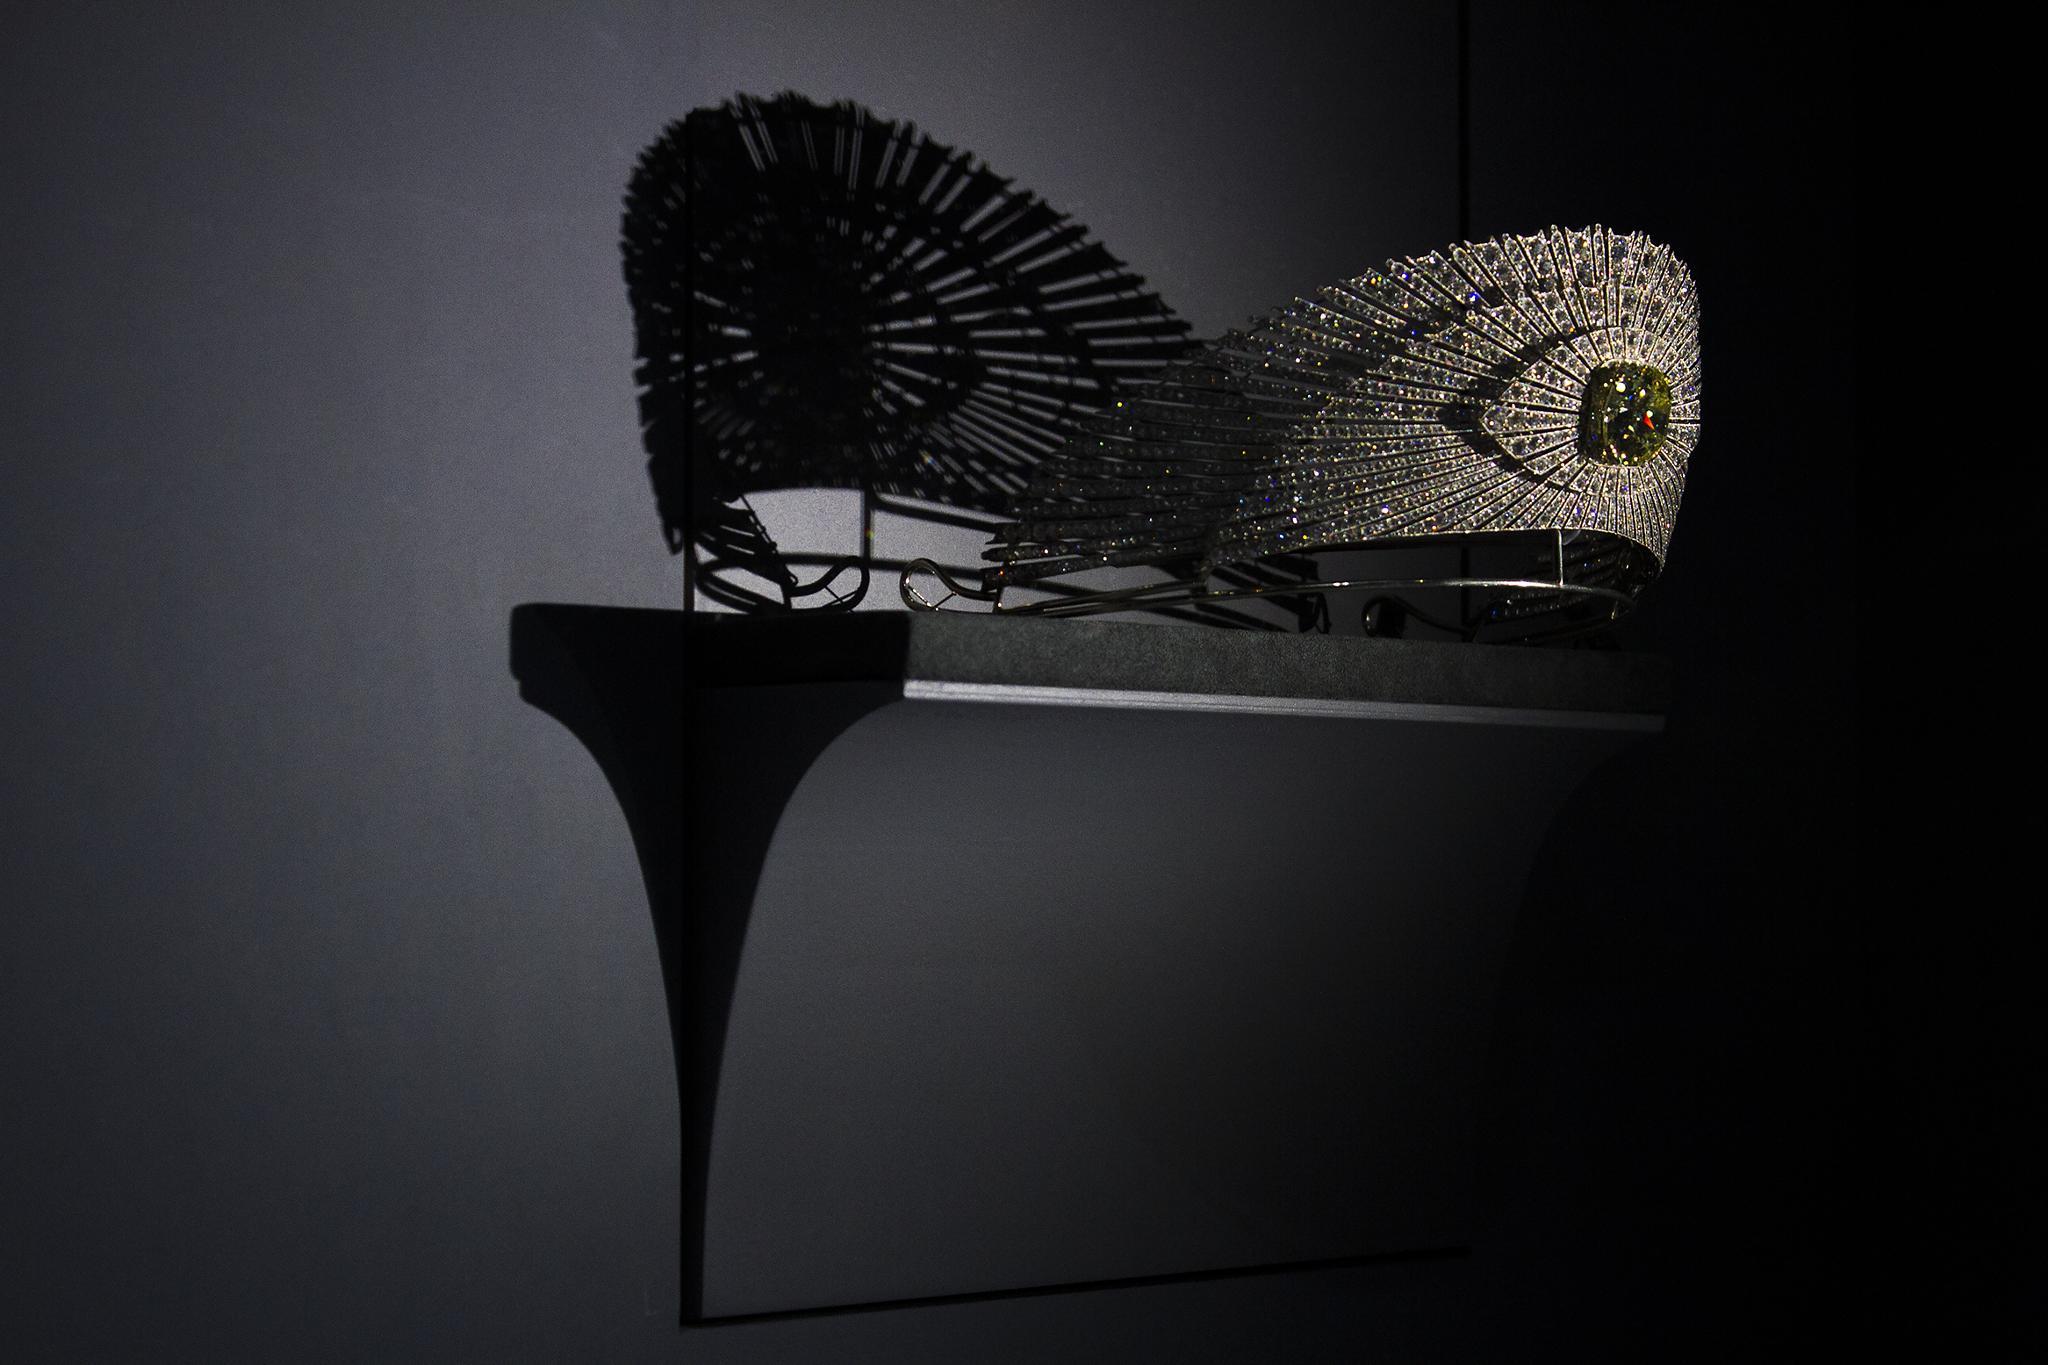 Cartier Sunburst Tiara Shadow by Woowah